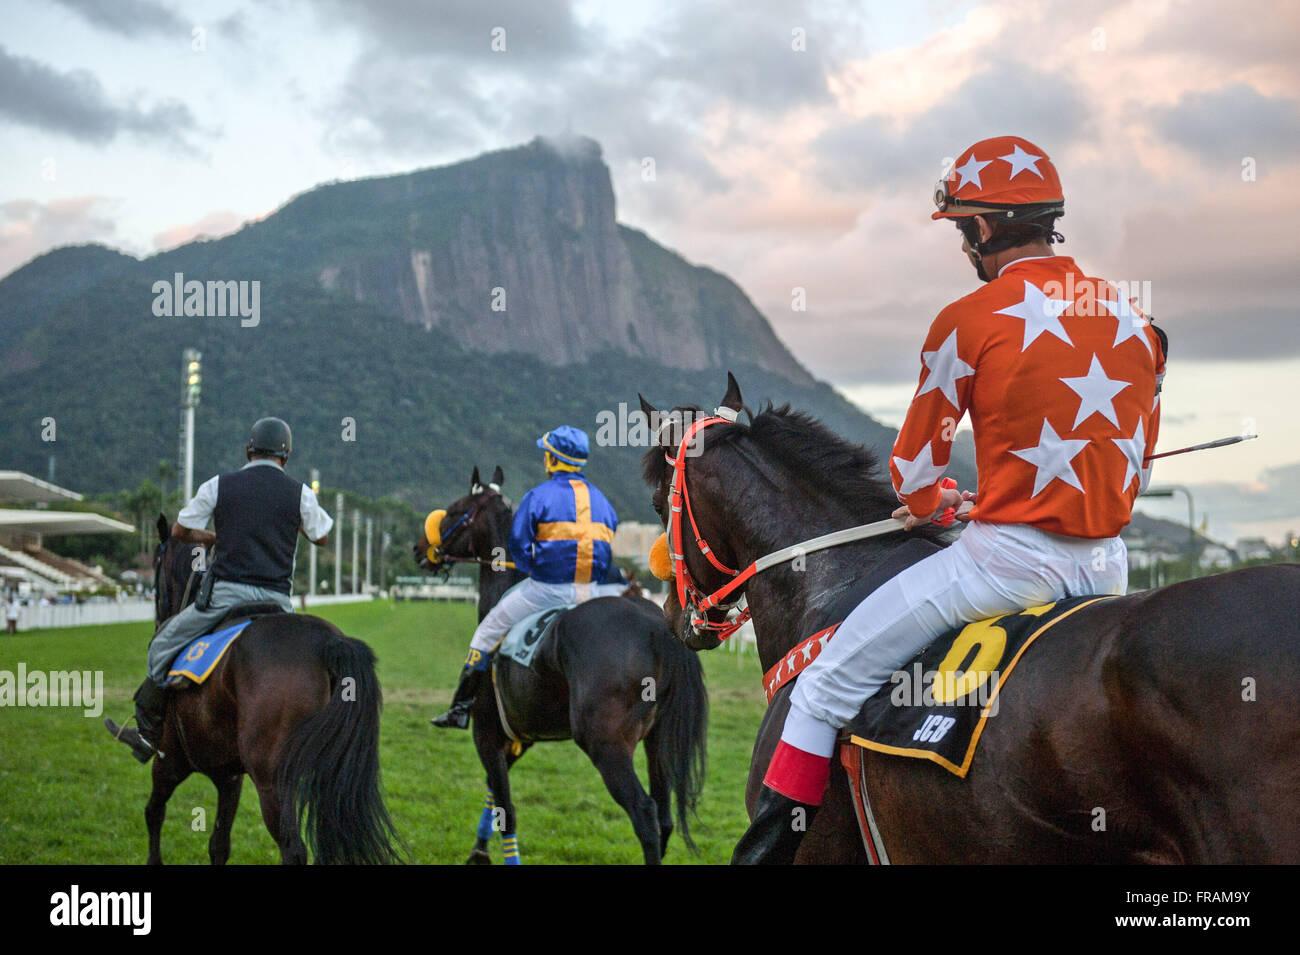 Horse Racing in Brazilian Jockey Club - Stock Image